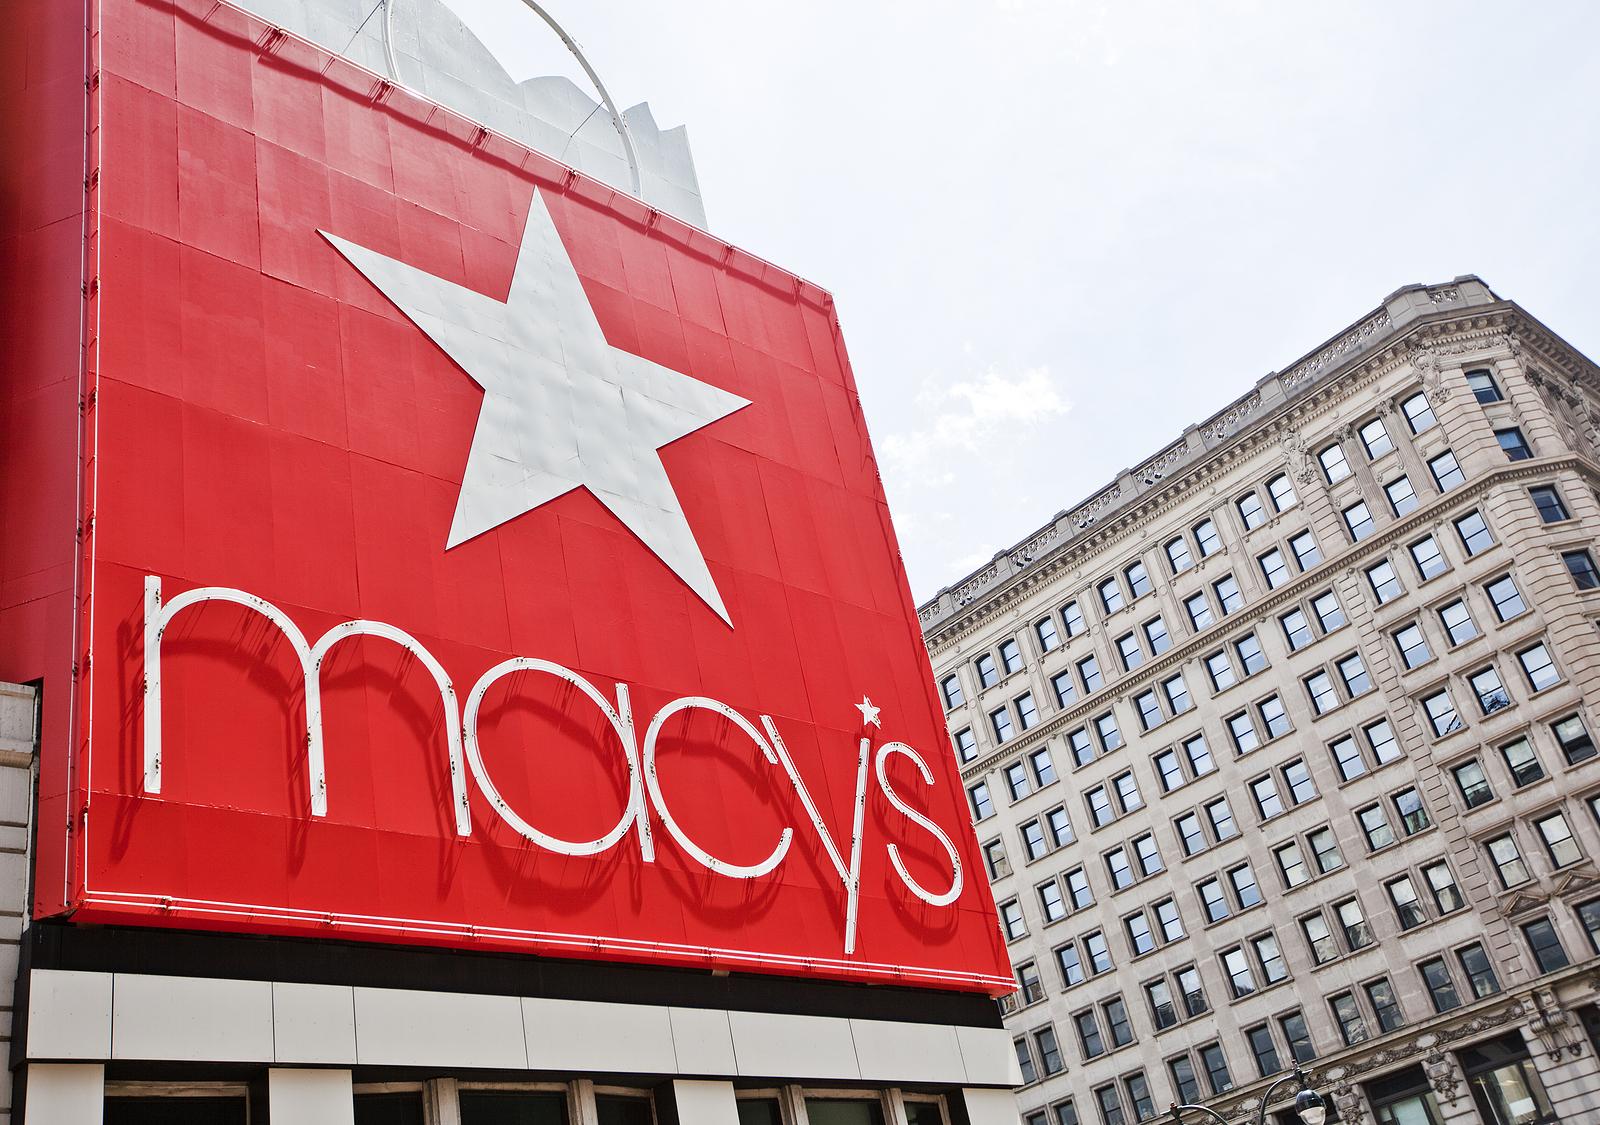 Macys stock, Macy